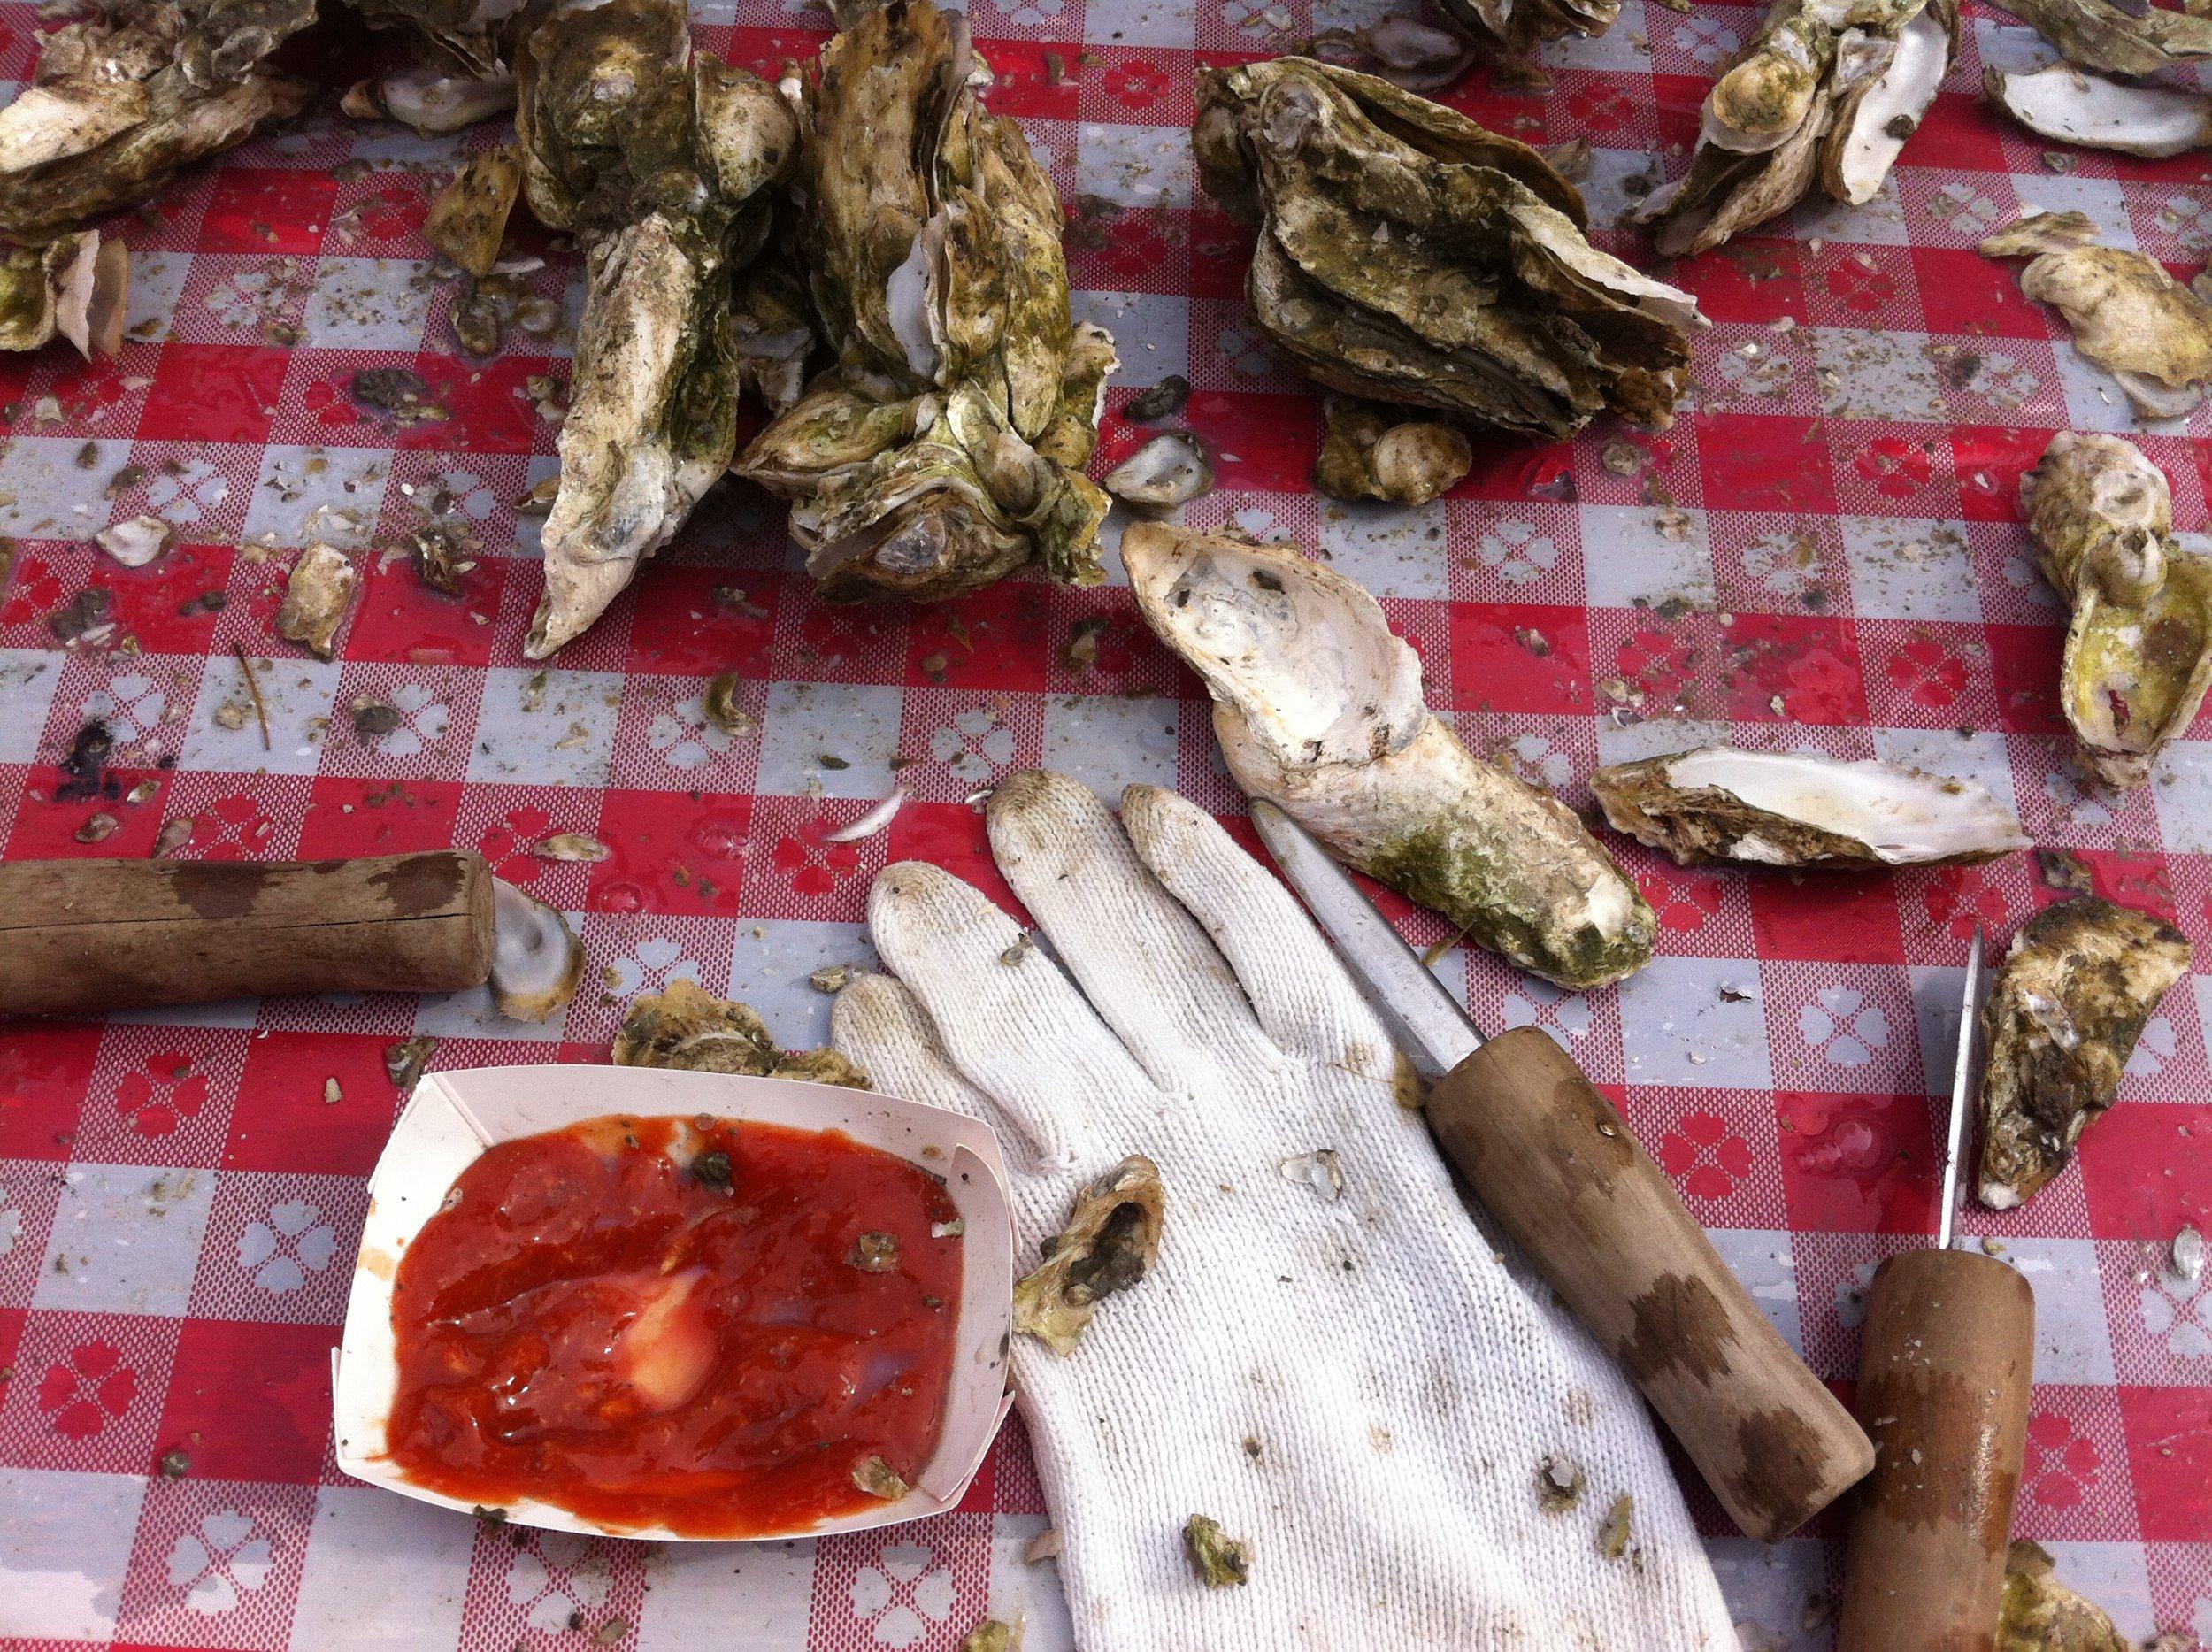 Backyard oyster roast